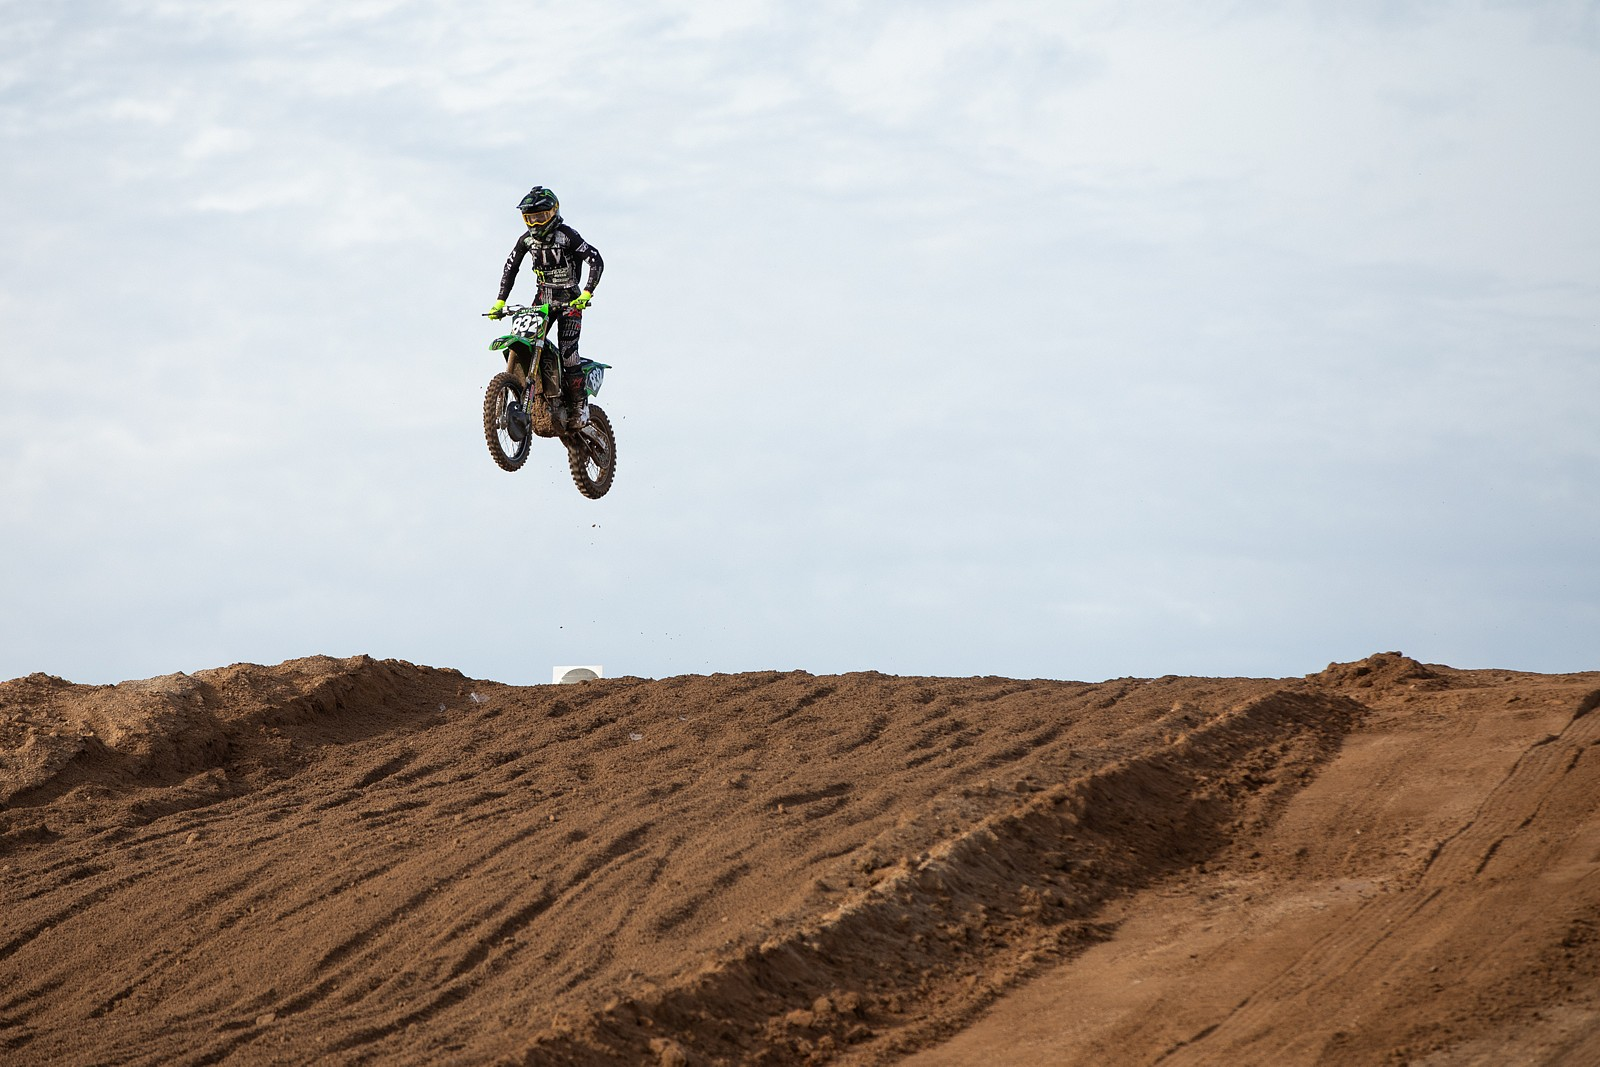 Chance Hymas - AZ Open of Motocross, Part 1 - Motocross Pictures - Vital MX